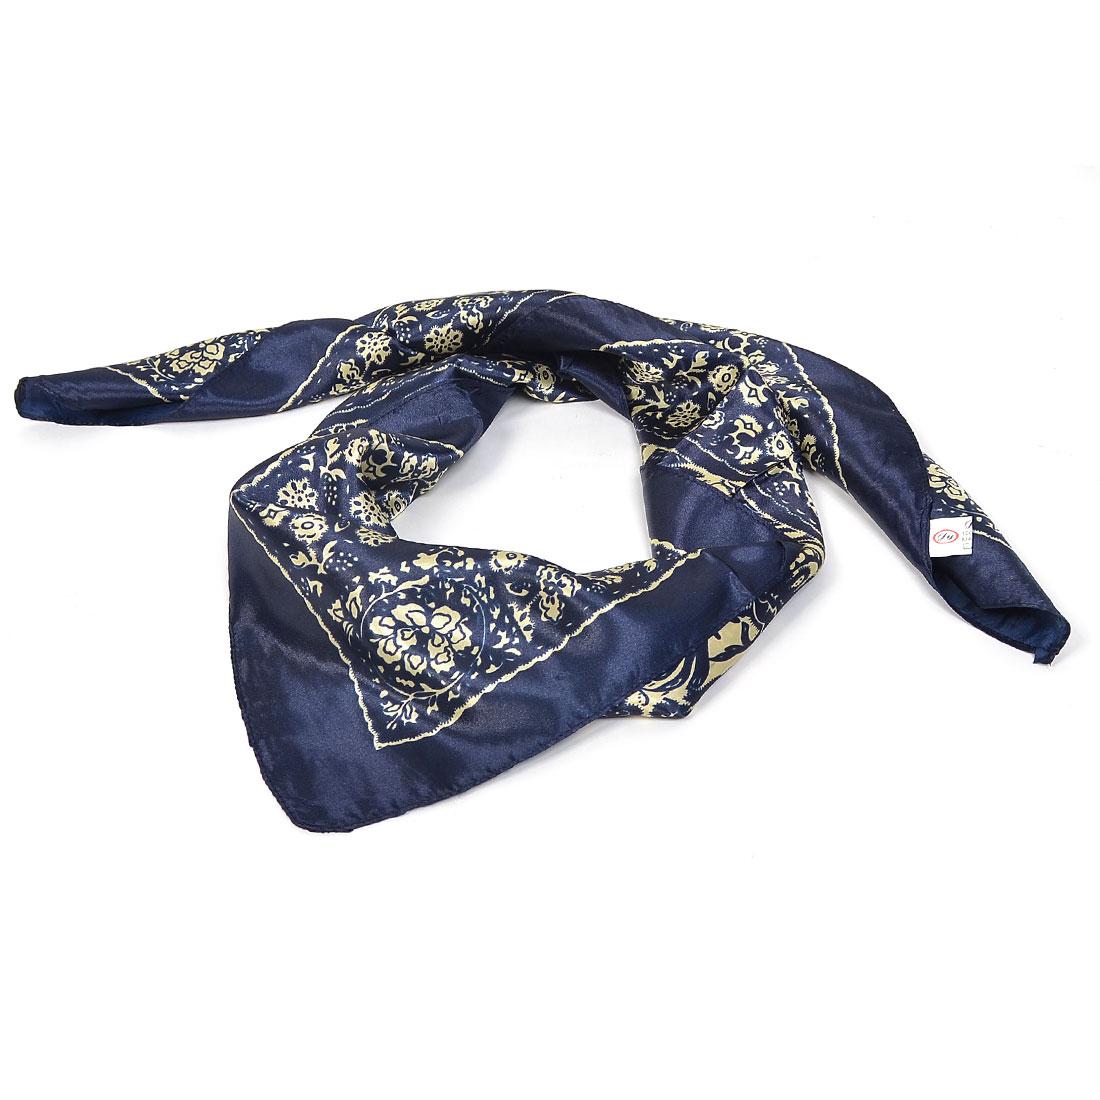 89cm x 89cm Florals Print Square Neckerchief Scarf Navy Blue Beige for Ladies